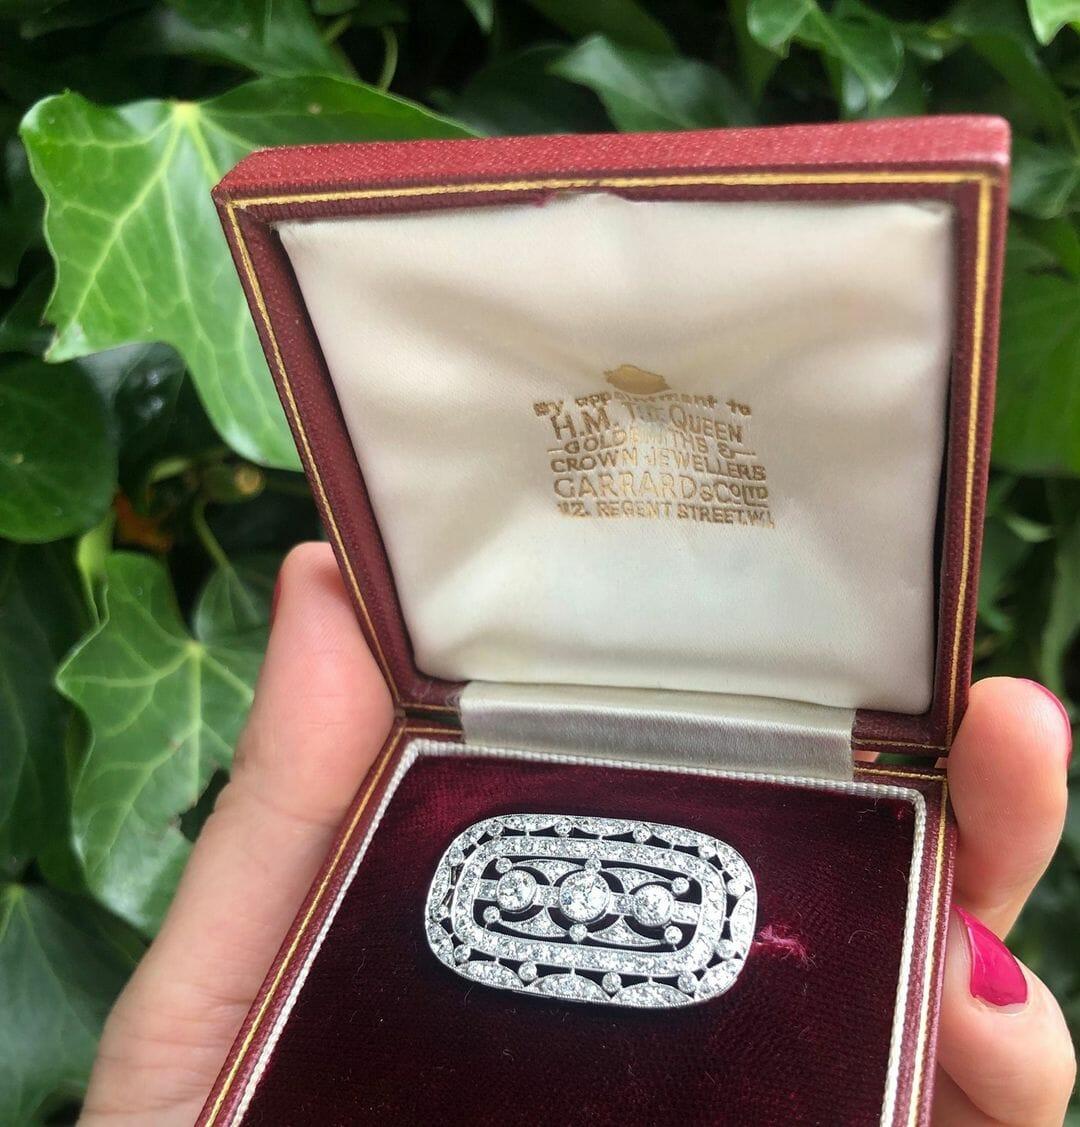 Etiquette for Inheritance Jewellery